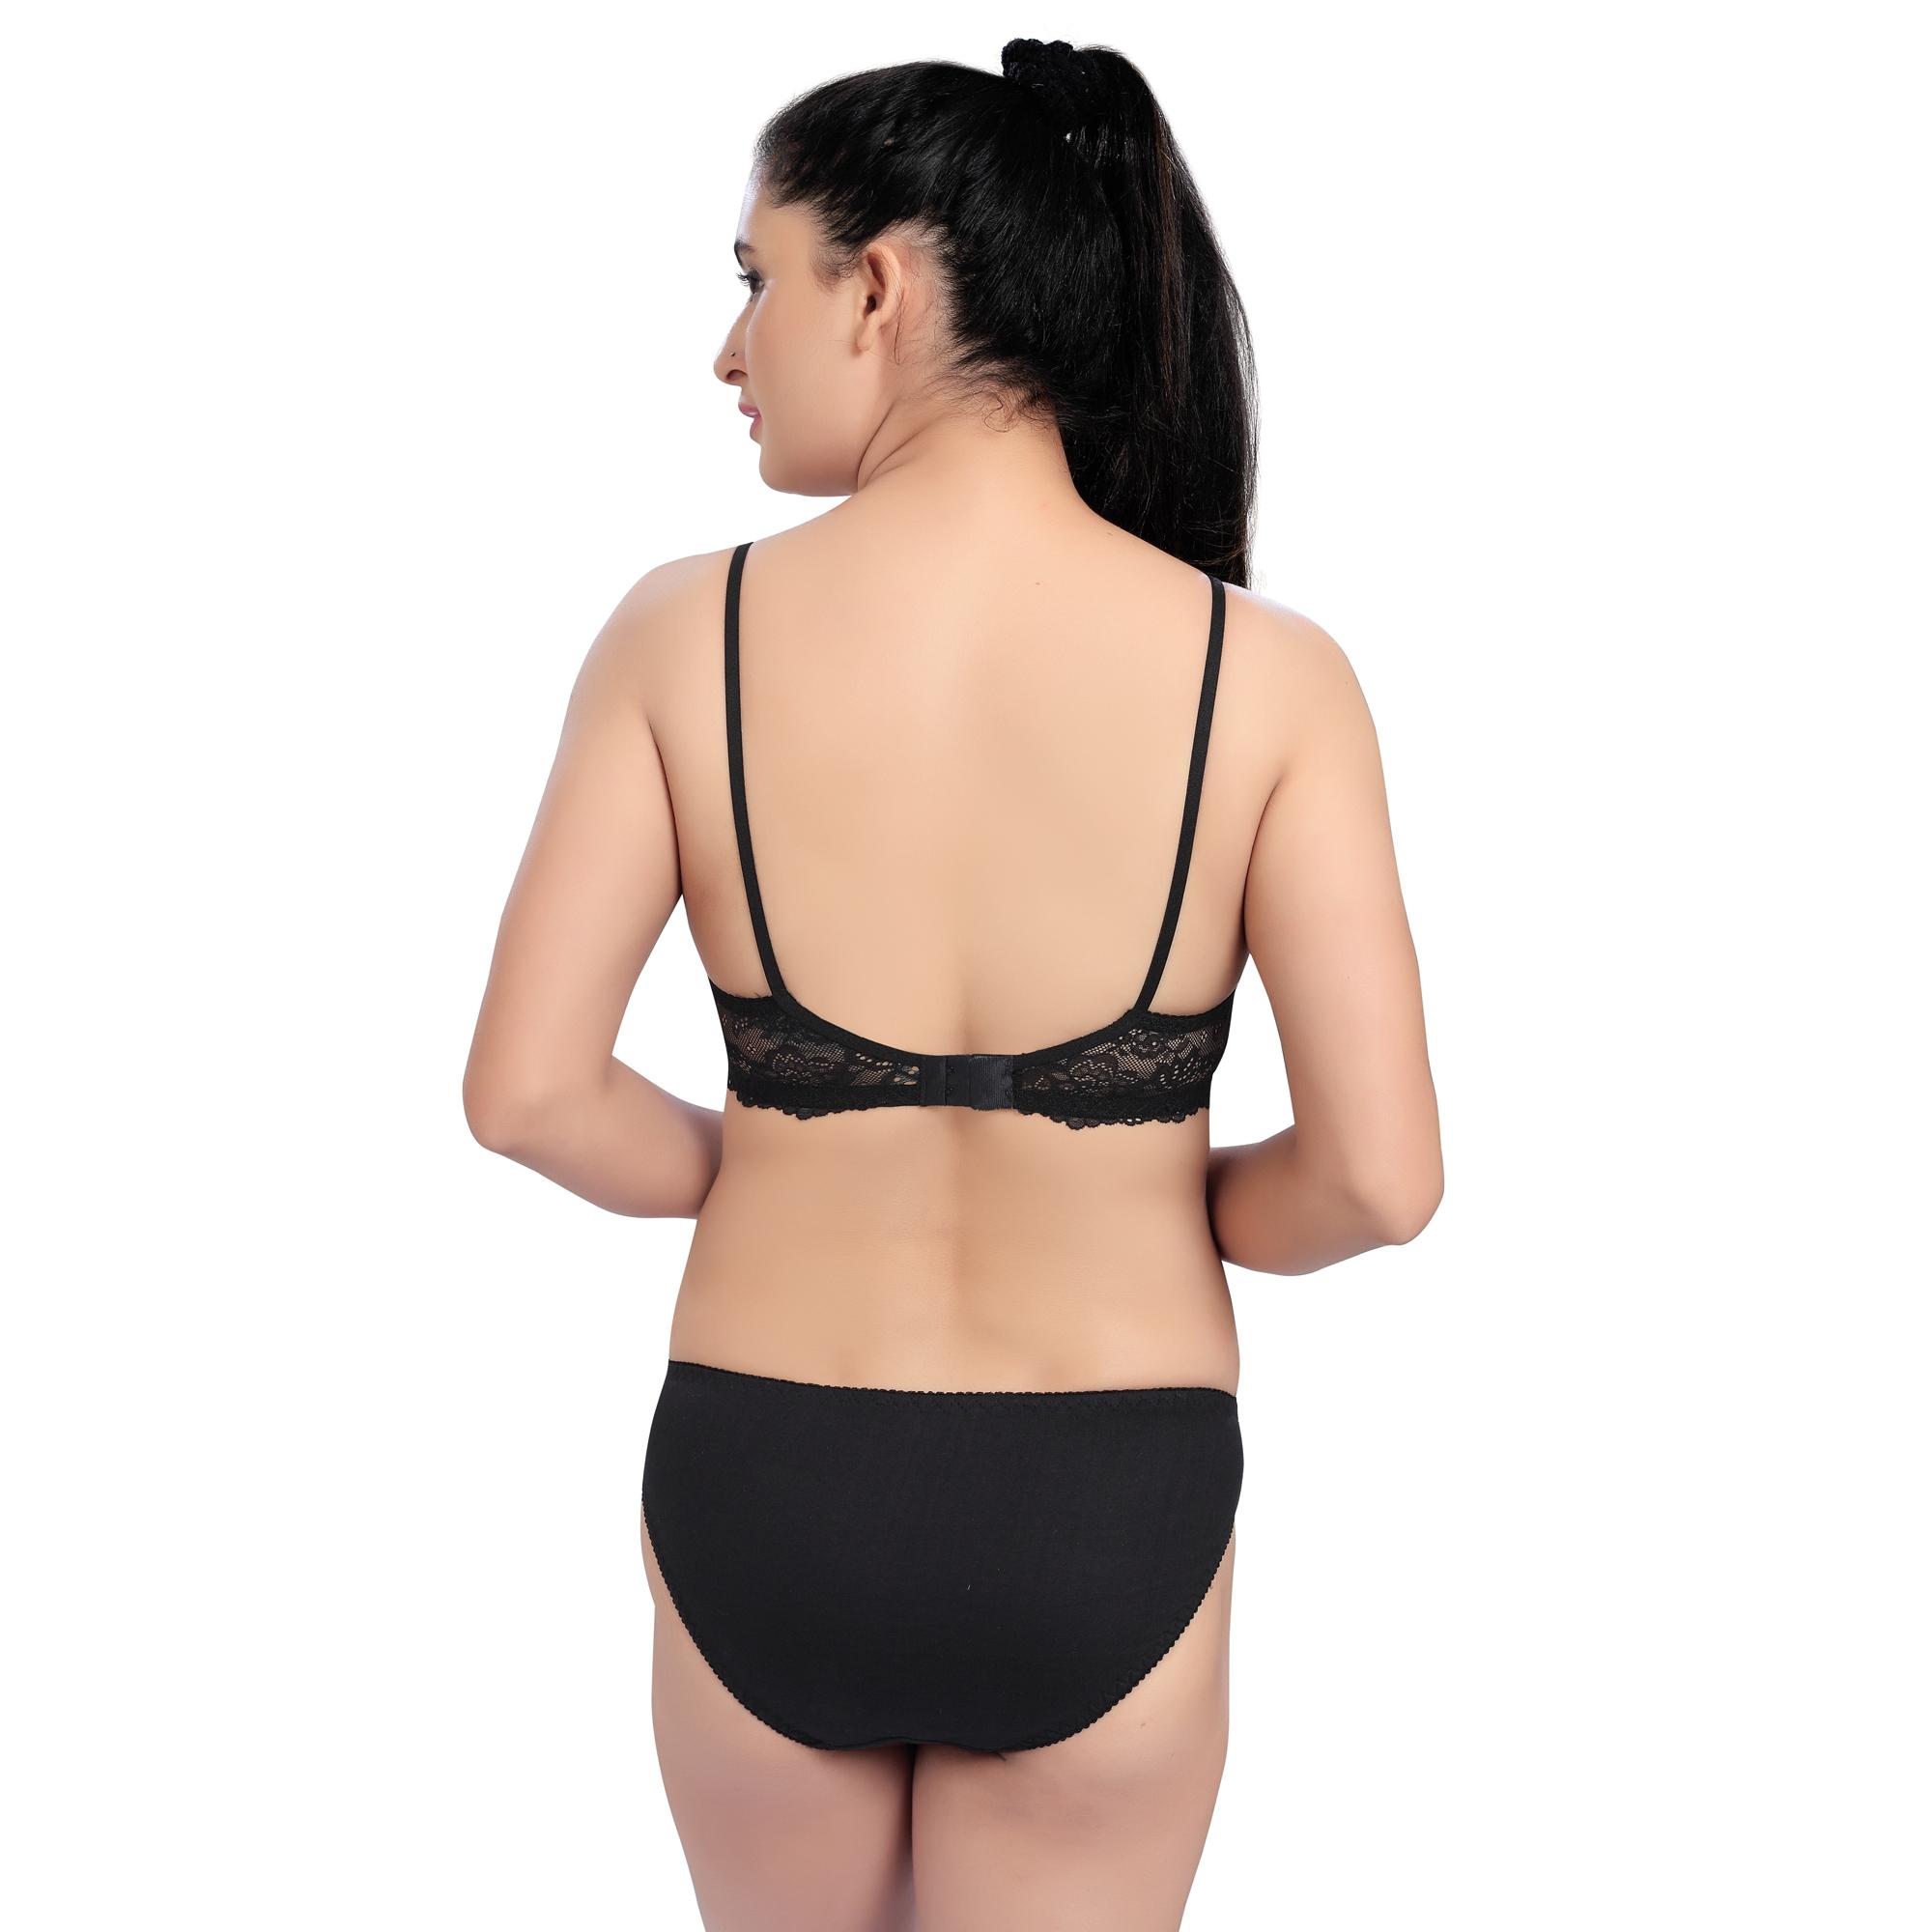 Women Undergarments Sets